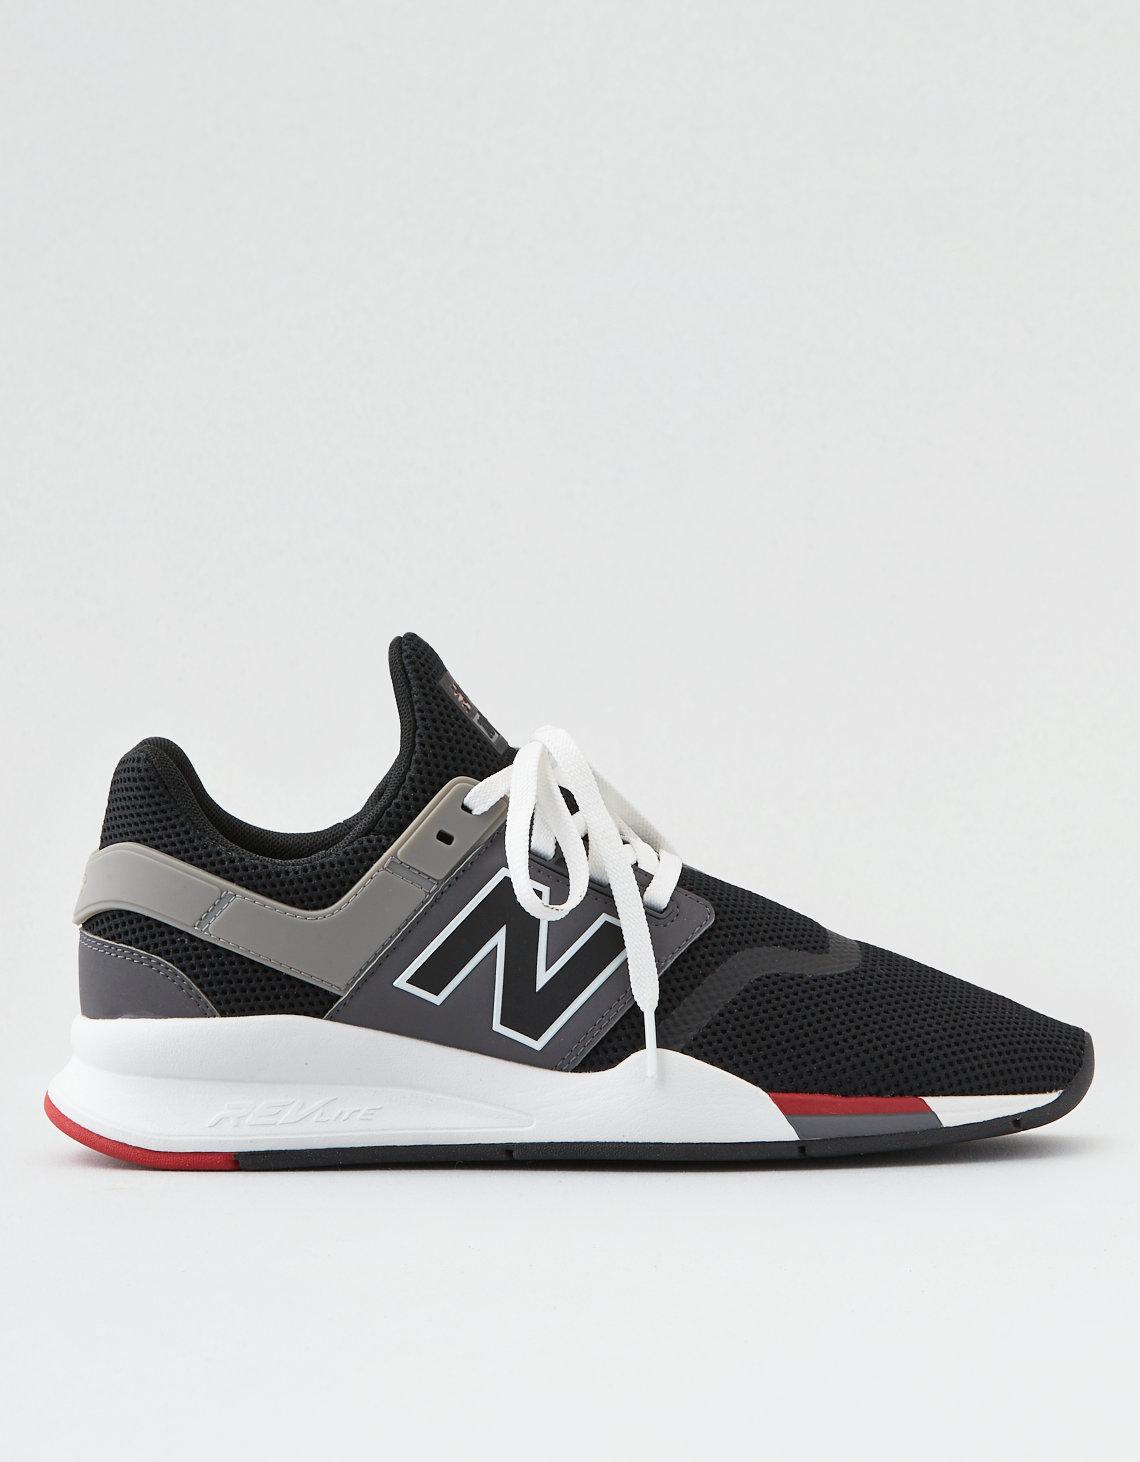 buy popular c1356 501b0 New Balance 247v2 Sneaker. Placeholder image. Product Image